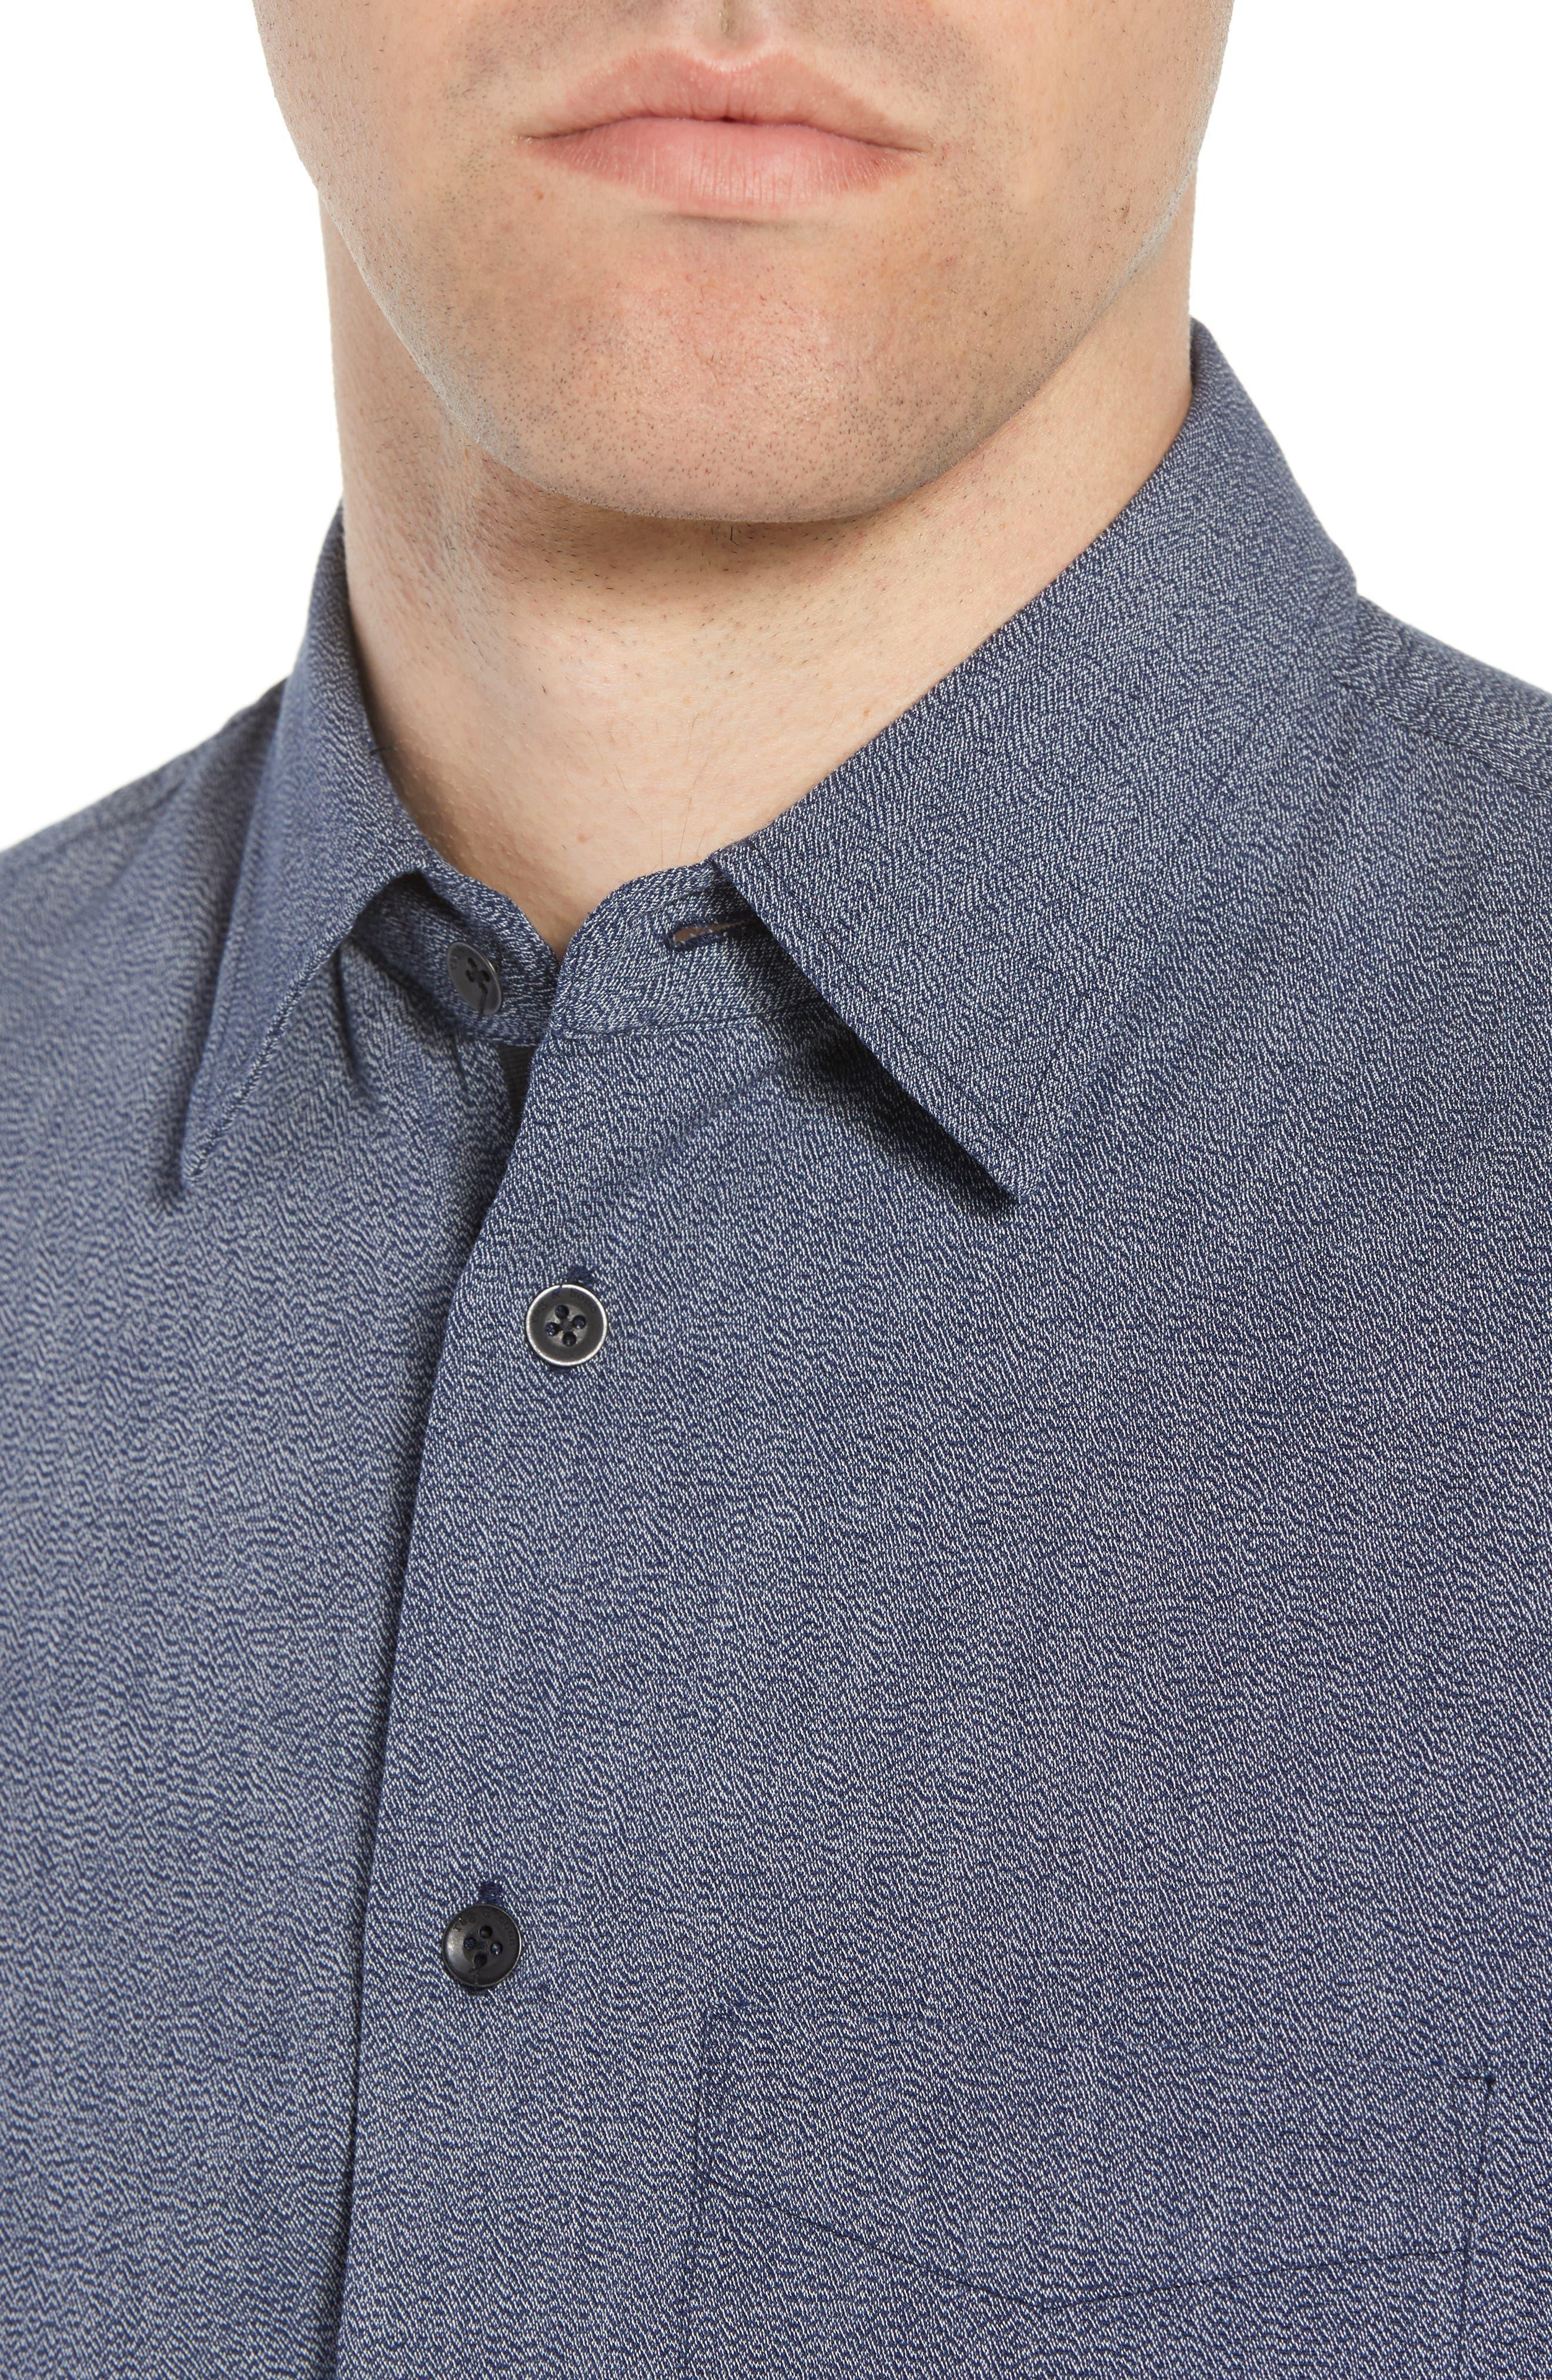 Regular Fit Short Sleeve Sport Shirt,                             Alternate thumbnail 4, color,                             BLUE